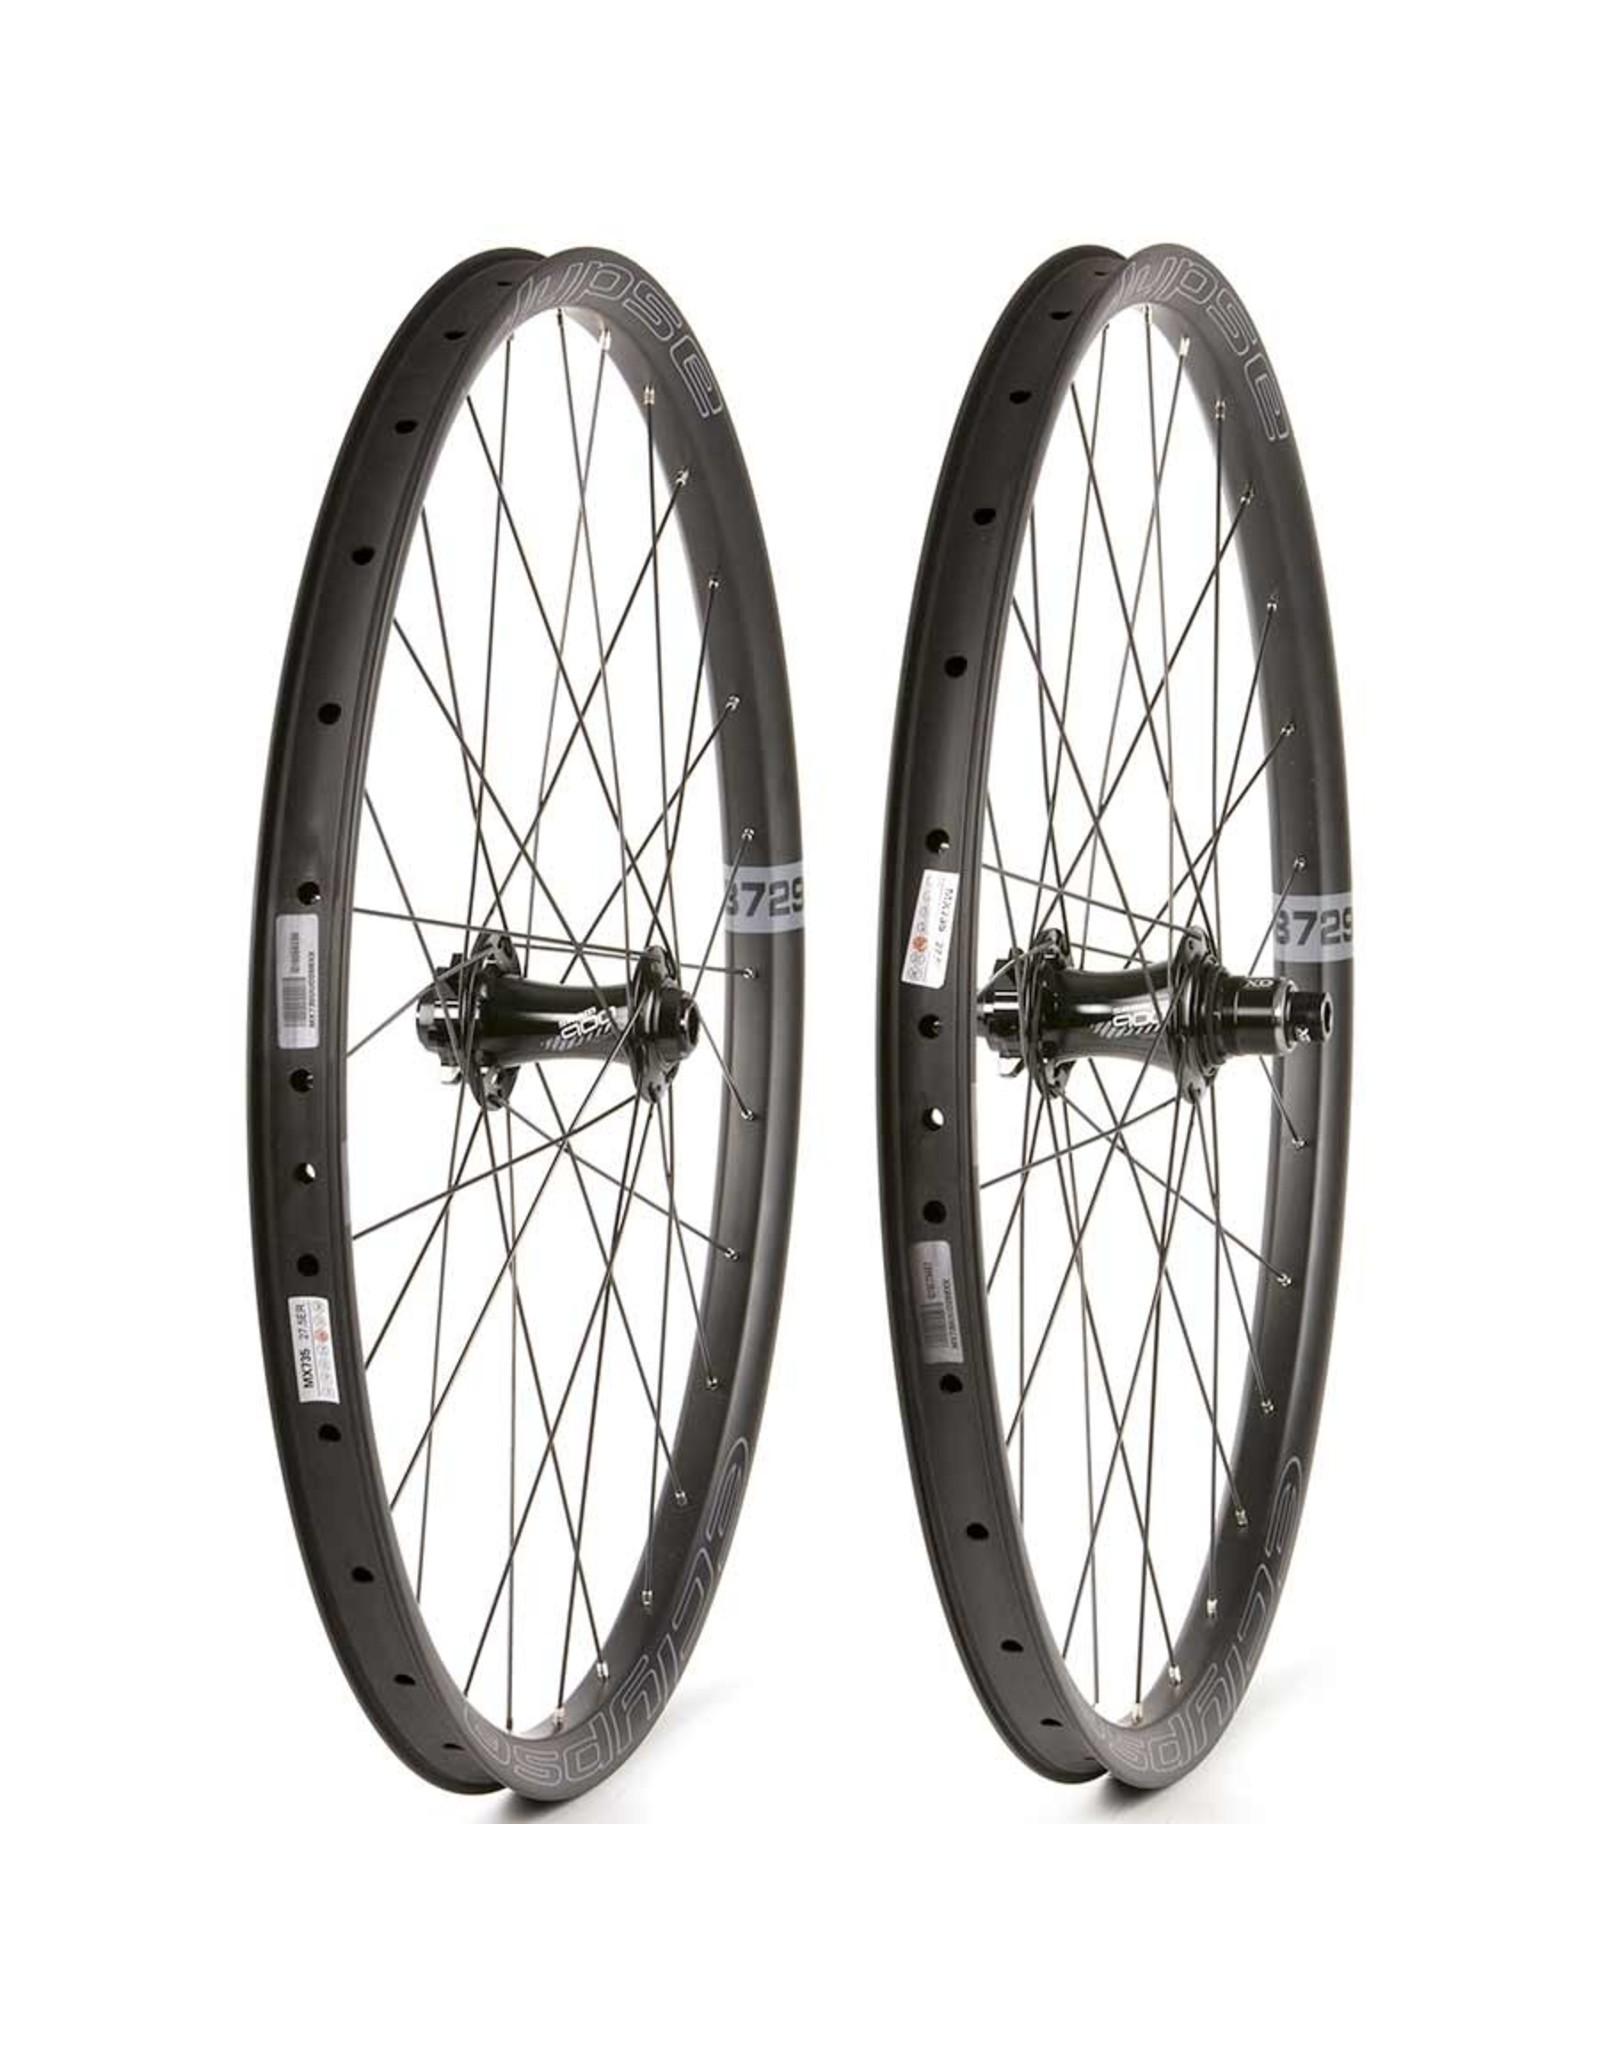 Eclypse Eclypse, DB729 Trail Boost XD, Wheel, Front and Rear, 27.5'' / 584, Holes: F: 28, R: 28, F: 15mm, R: 12mm, F: 110, R: 148, Disc IS 6-bolt, SRAM XD, Pair